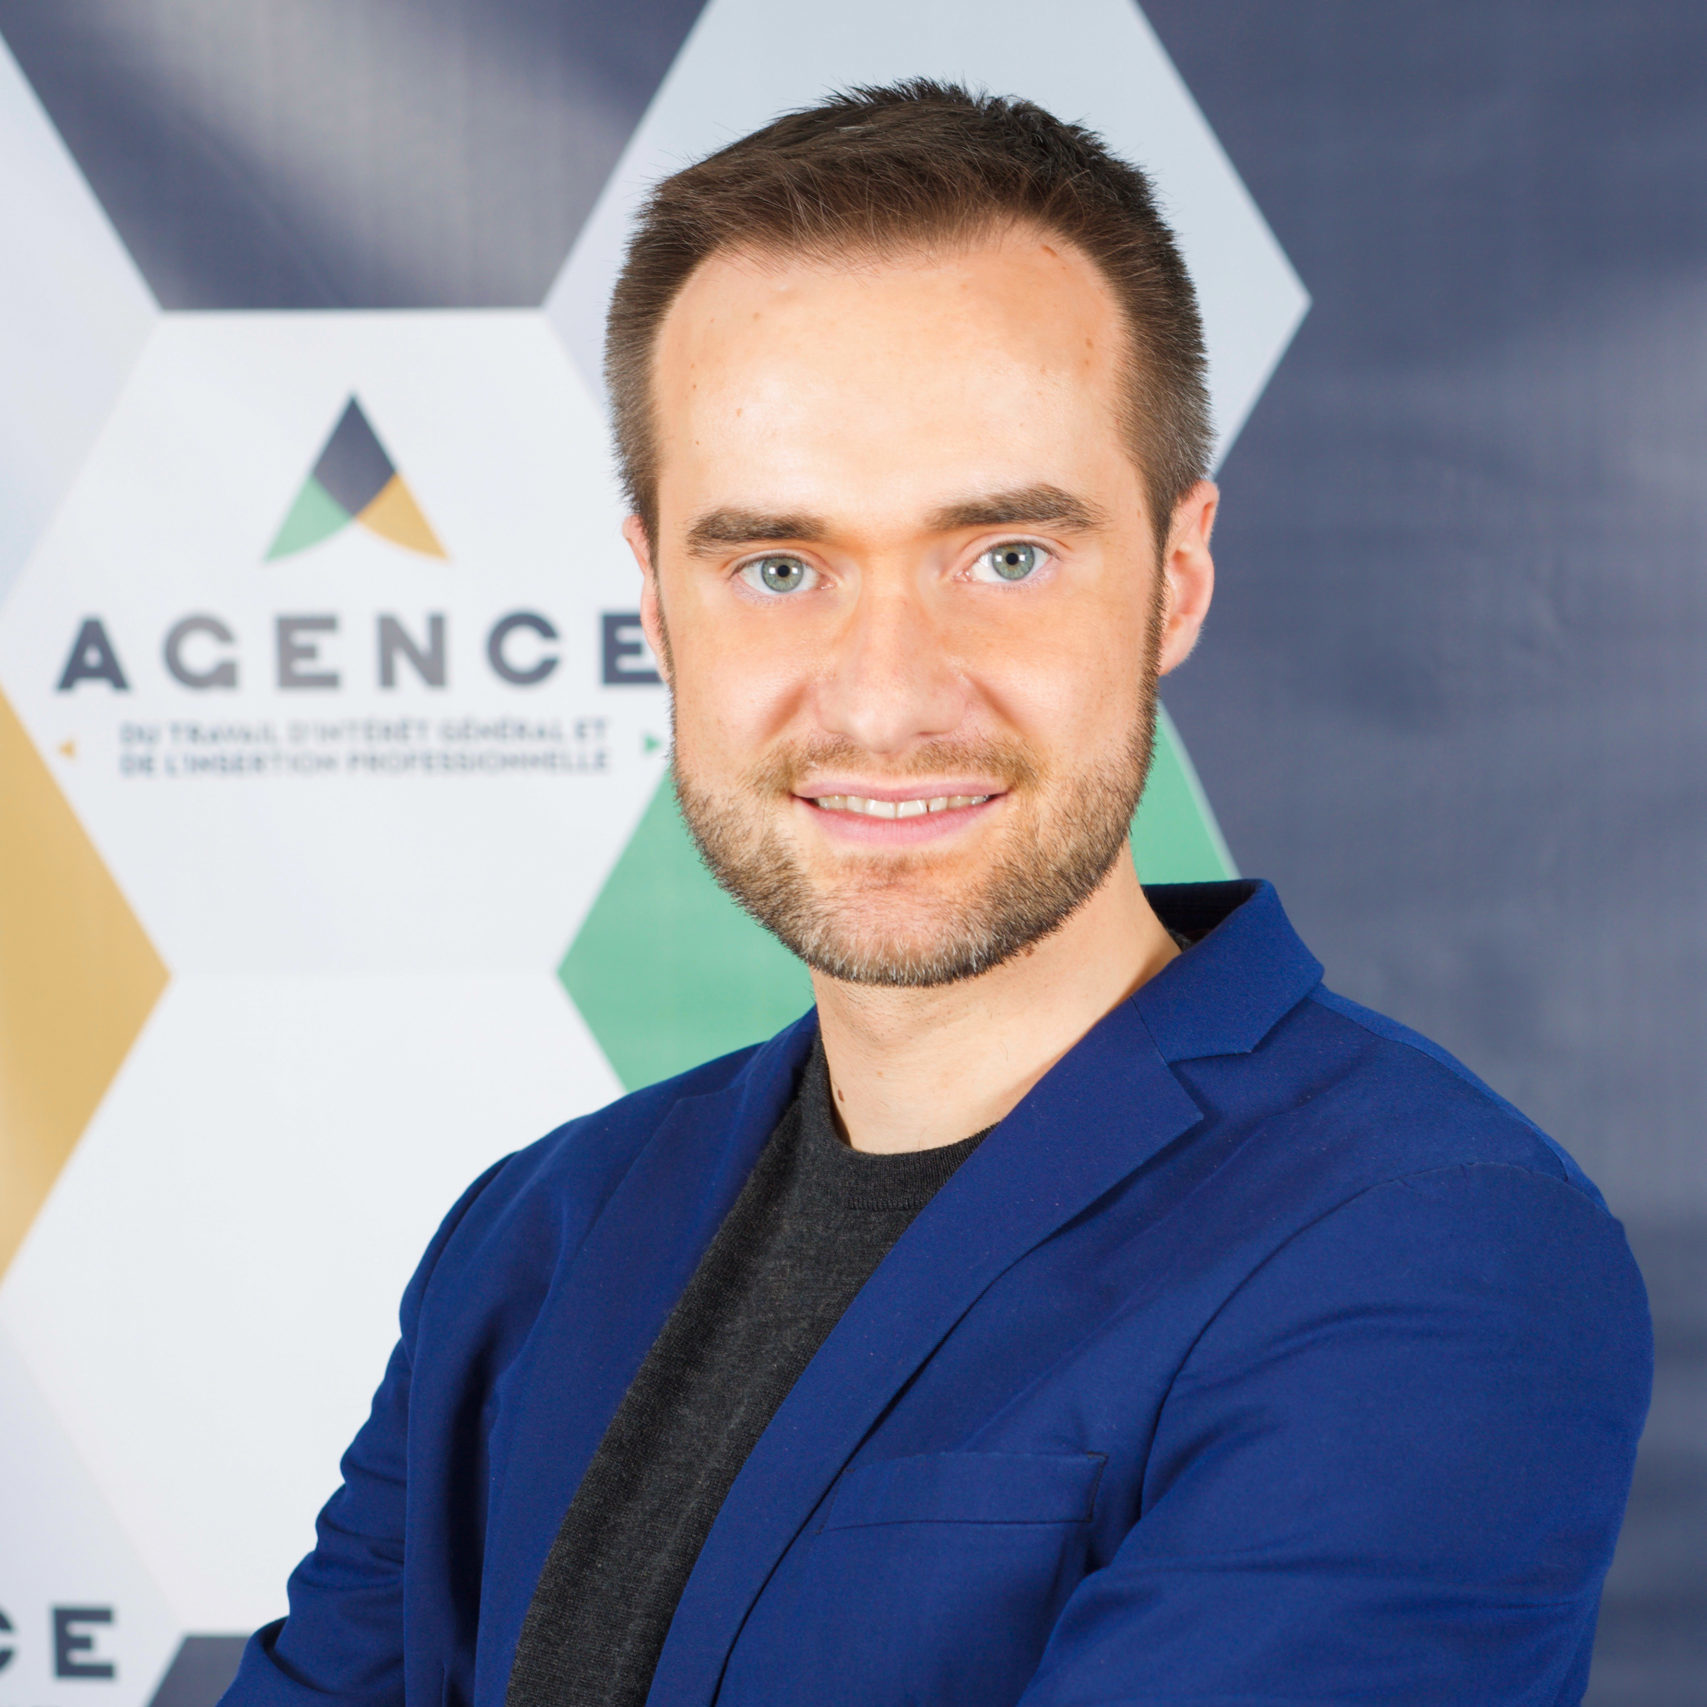 Benjamin Guichard - Chef du service SPAE